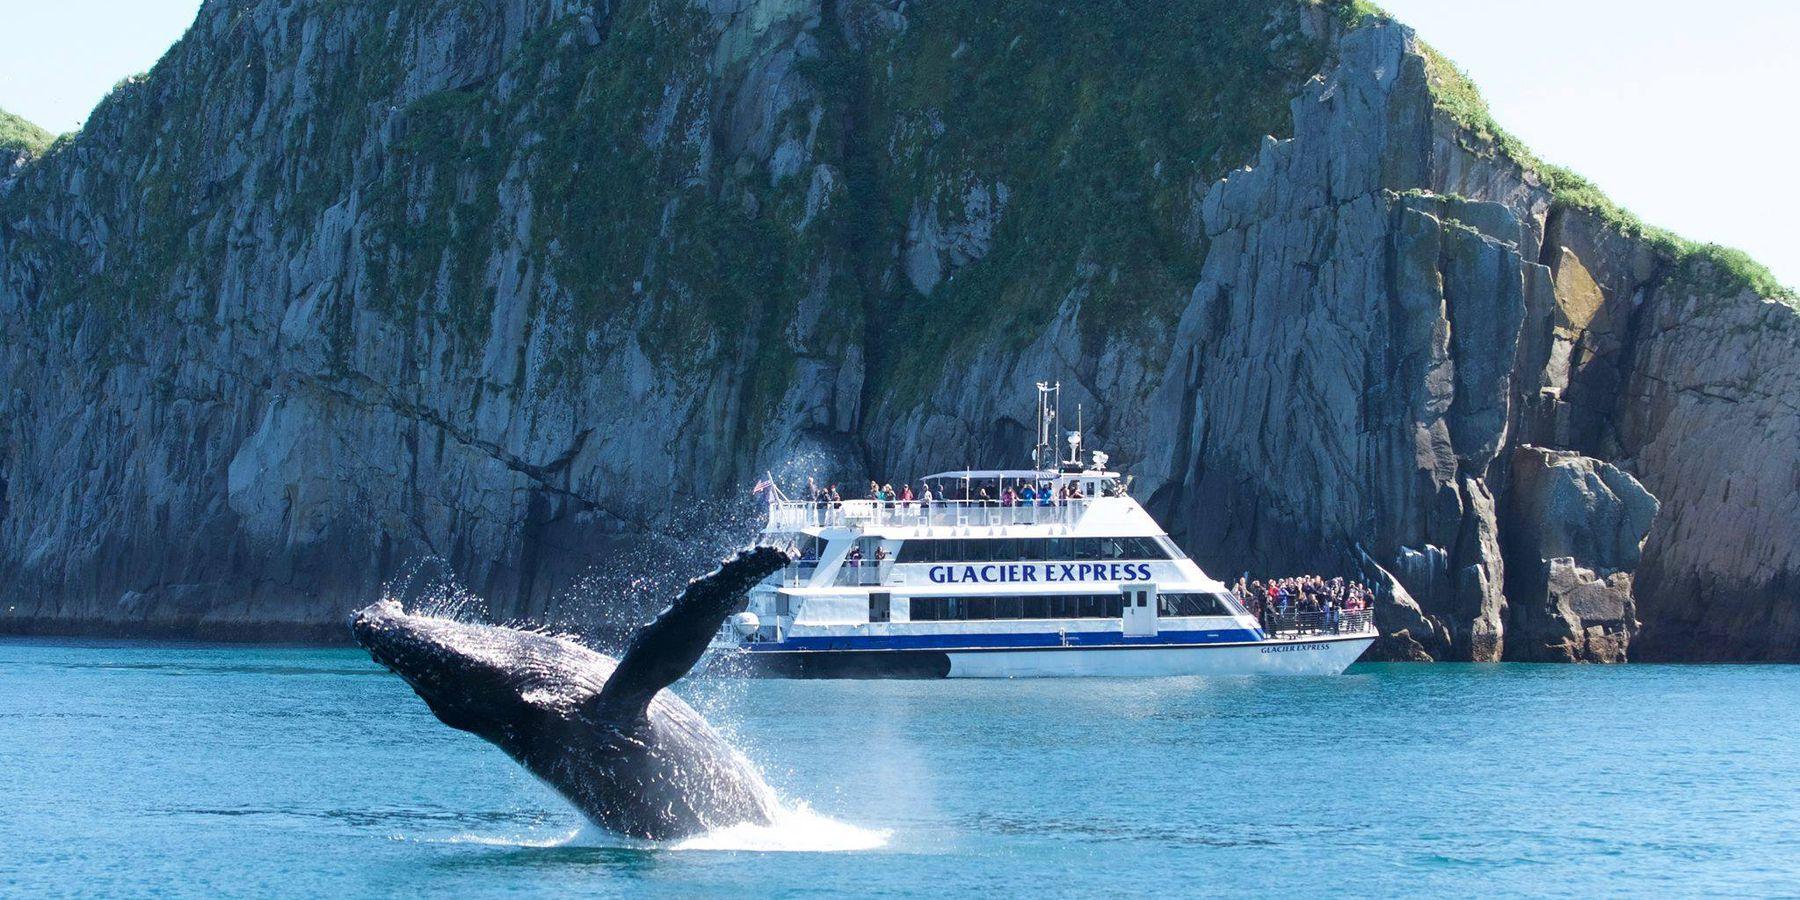 Glacier Cruise Prince William Sound - Alaska - Doets Reizen